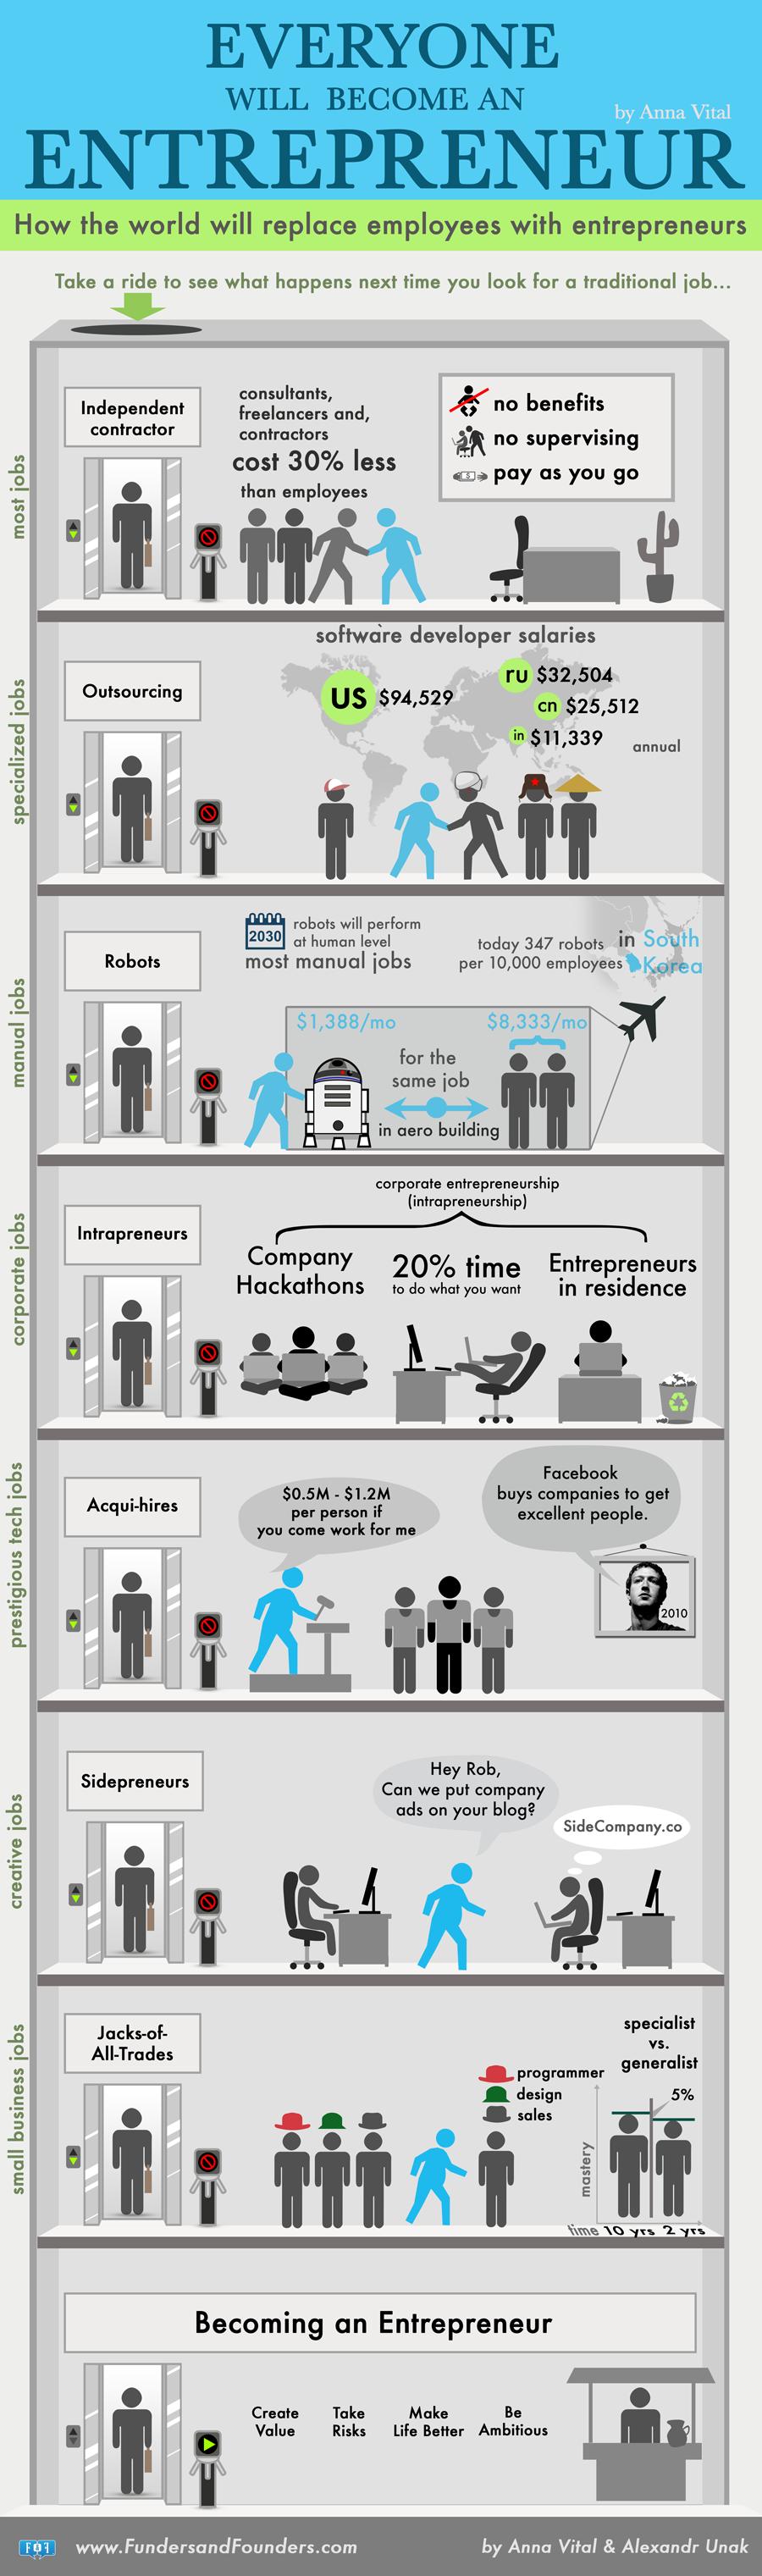 everyone-will-become-entrepreneur